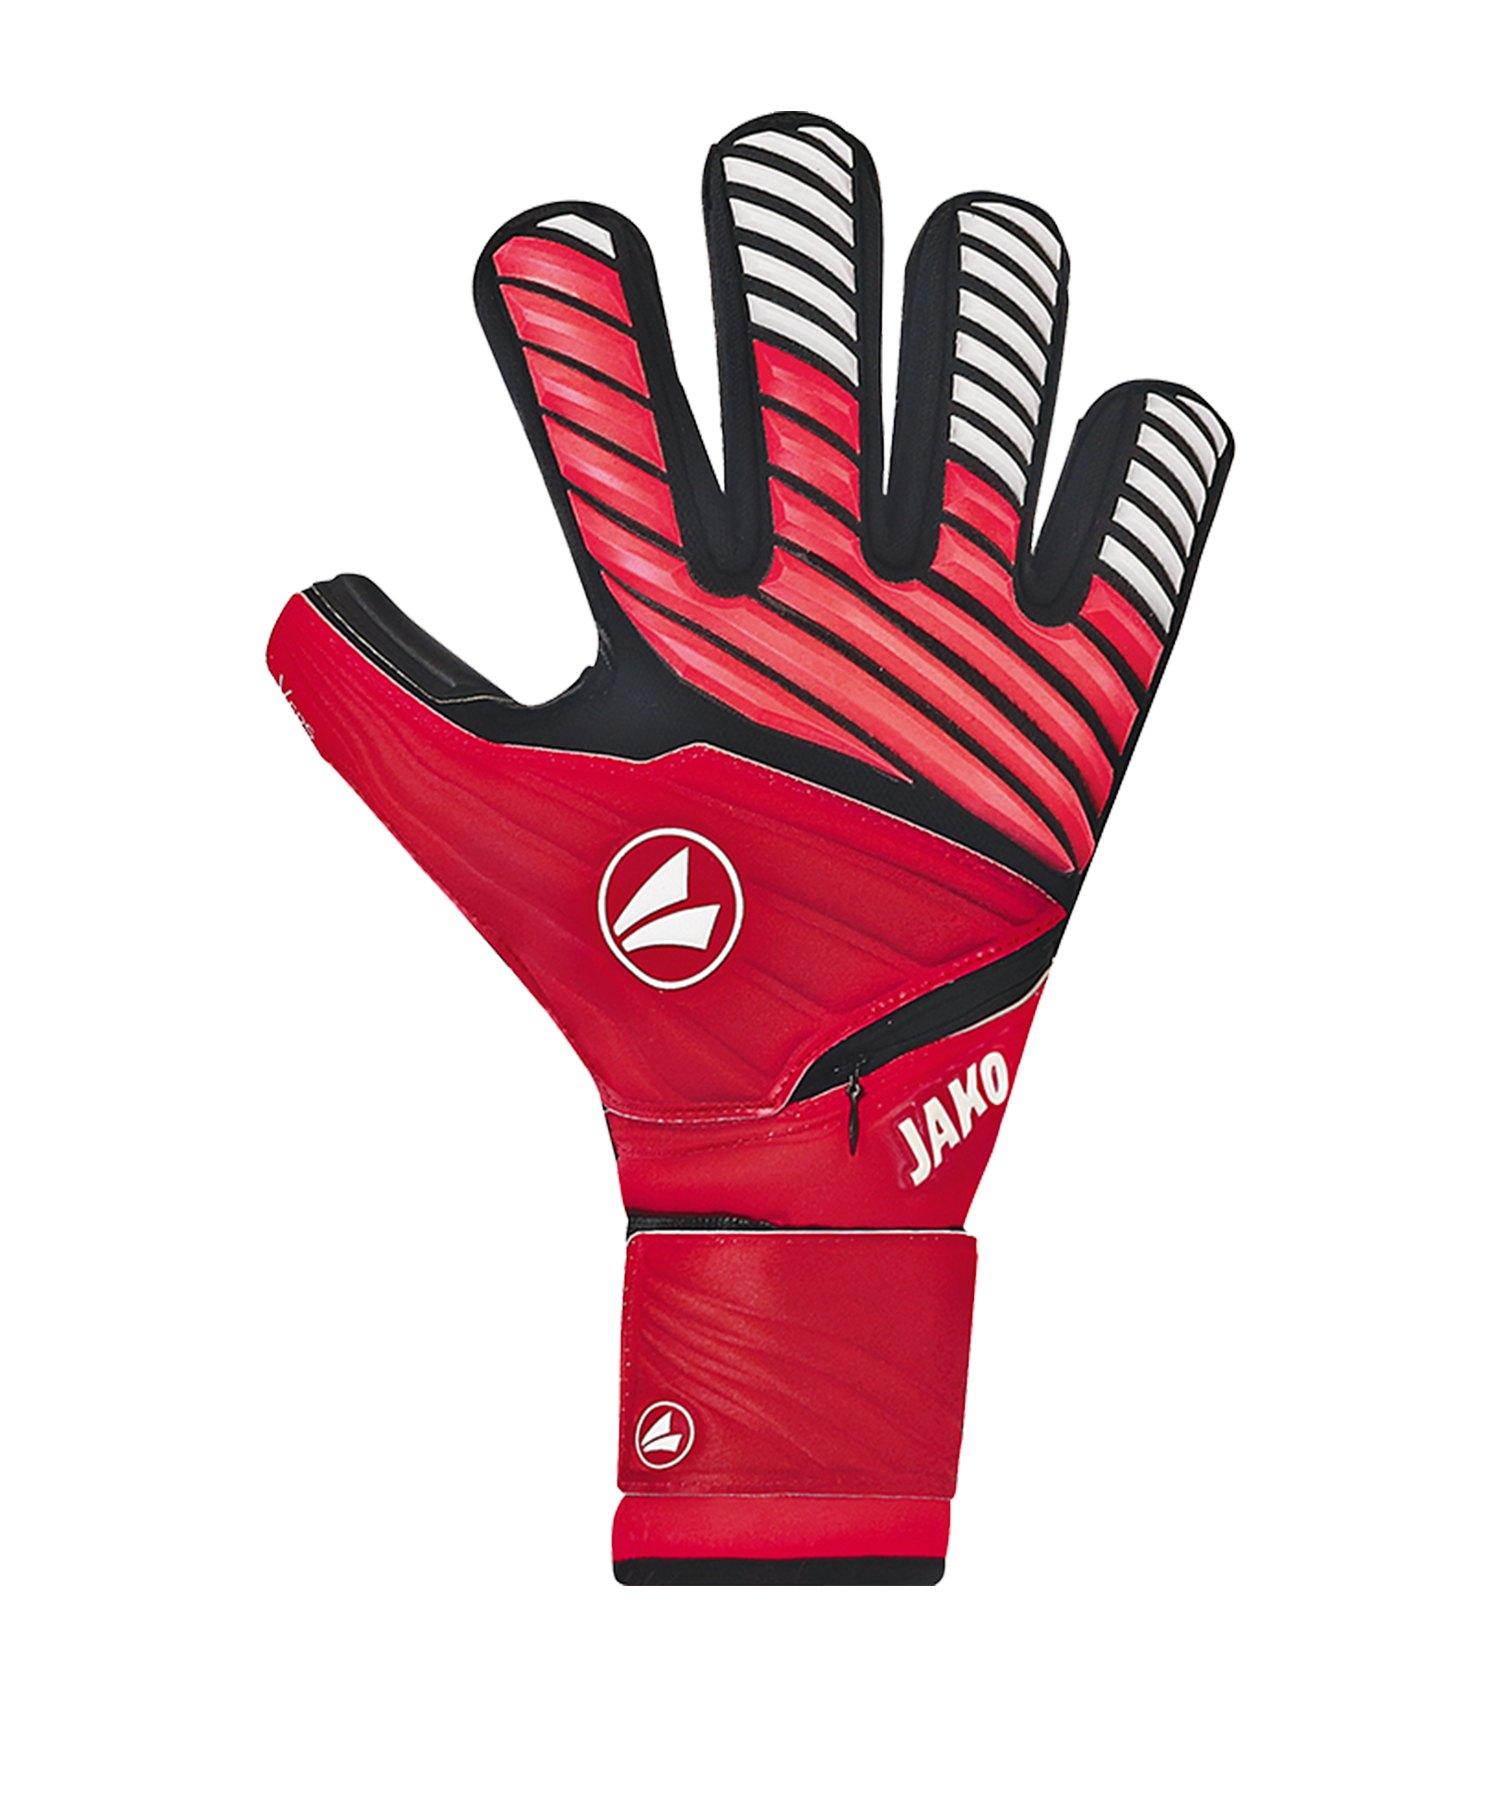 Jako Champ Giga WRC Protection TW-Handschuh F01 - rot